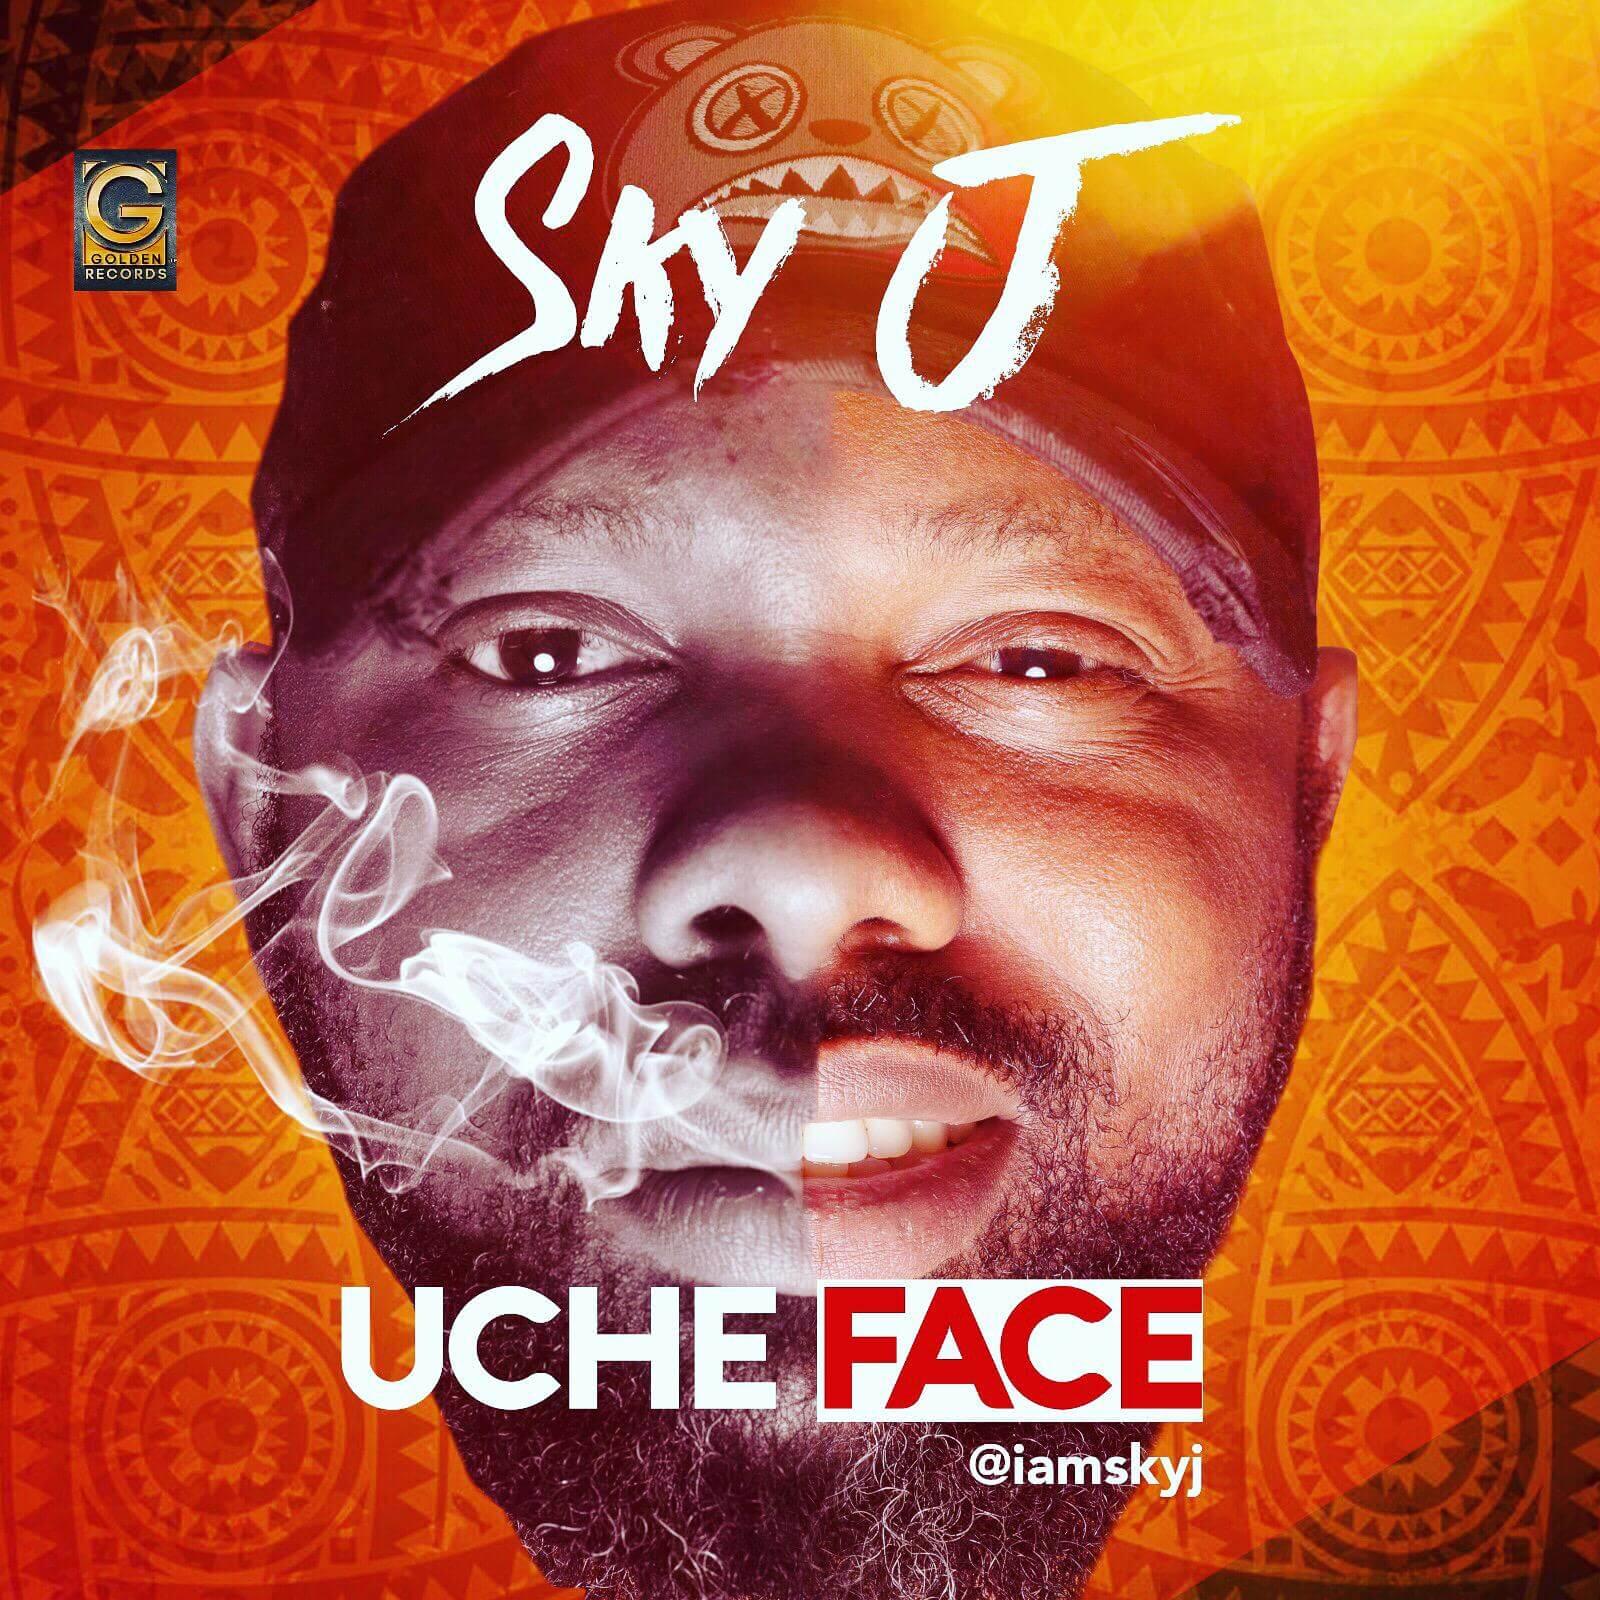 Sky J – Uche Face